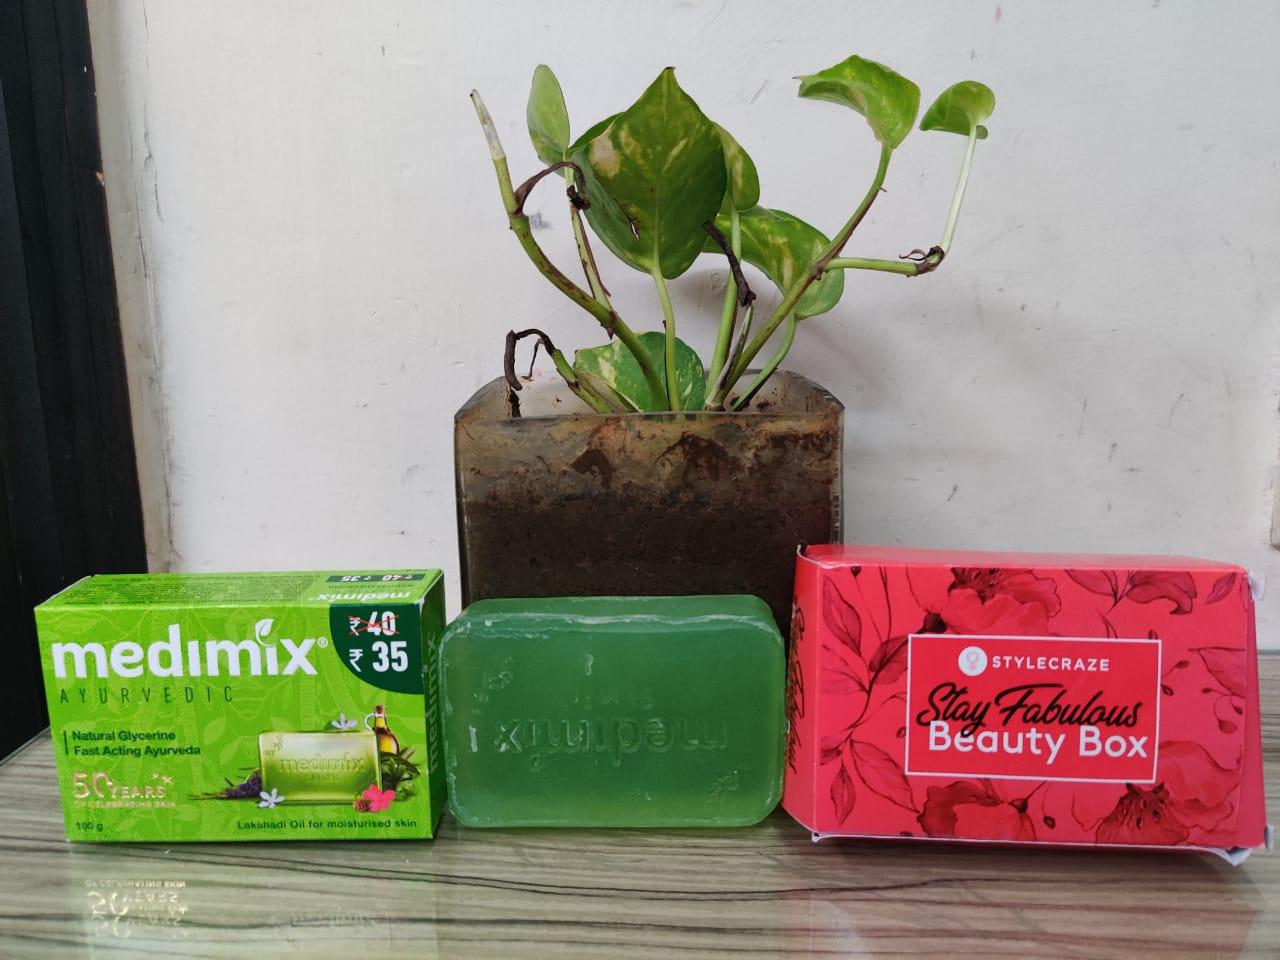 Medimix Ayurvedic Natural Glycerine soap with Lakshadi Oil -MEDIMIX AYURVEDIC SOAP-By rituka90